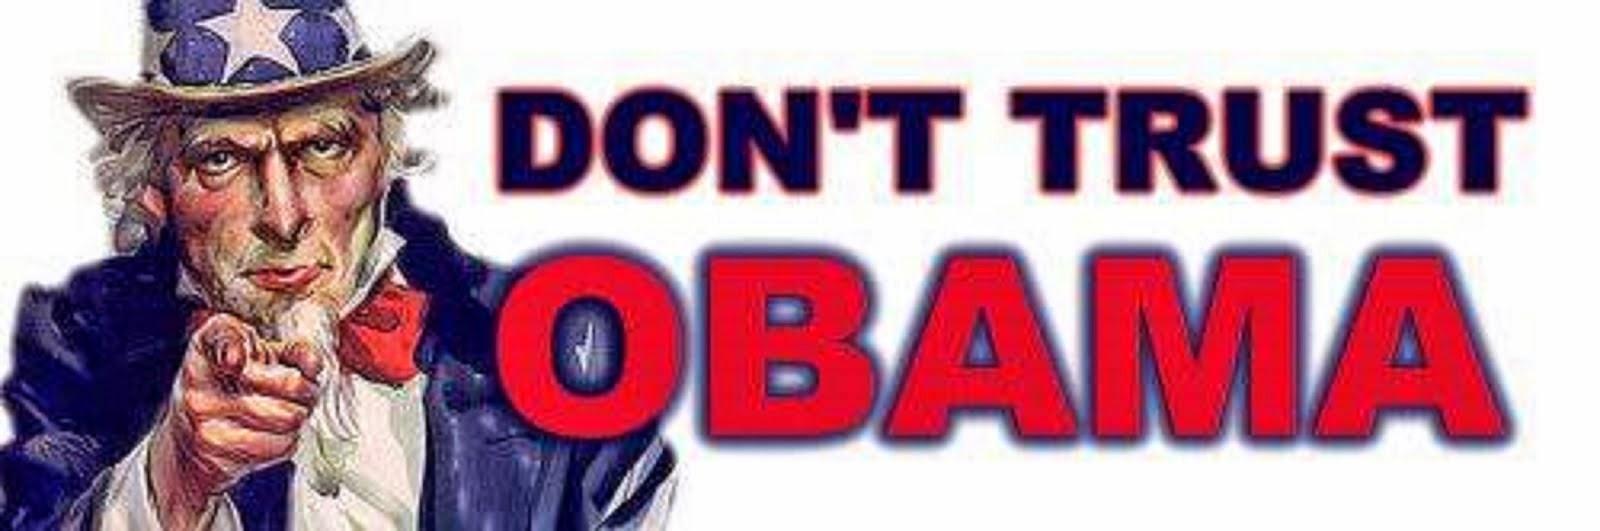 DON'T TRUST OBAMA